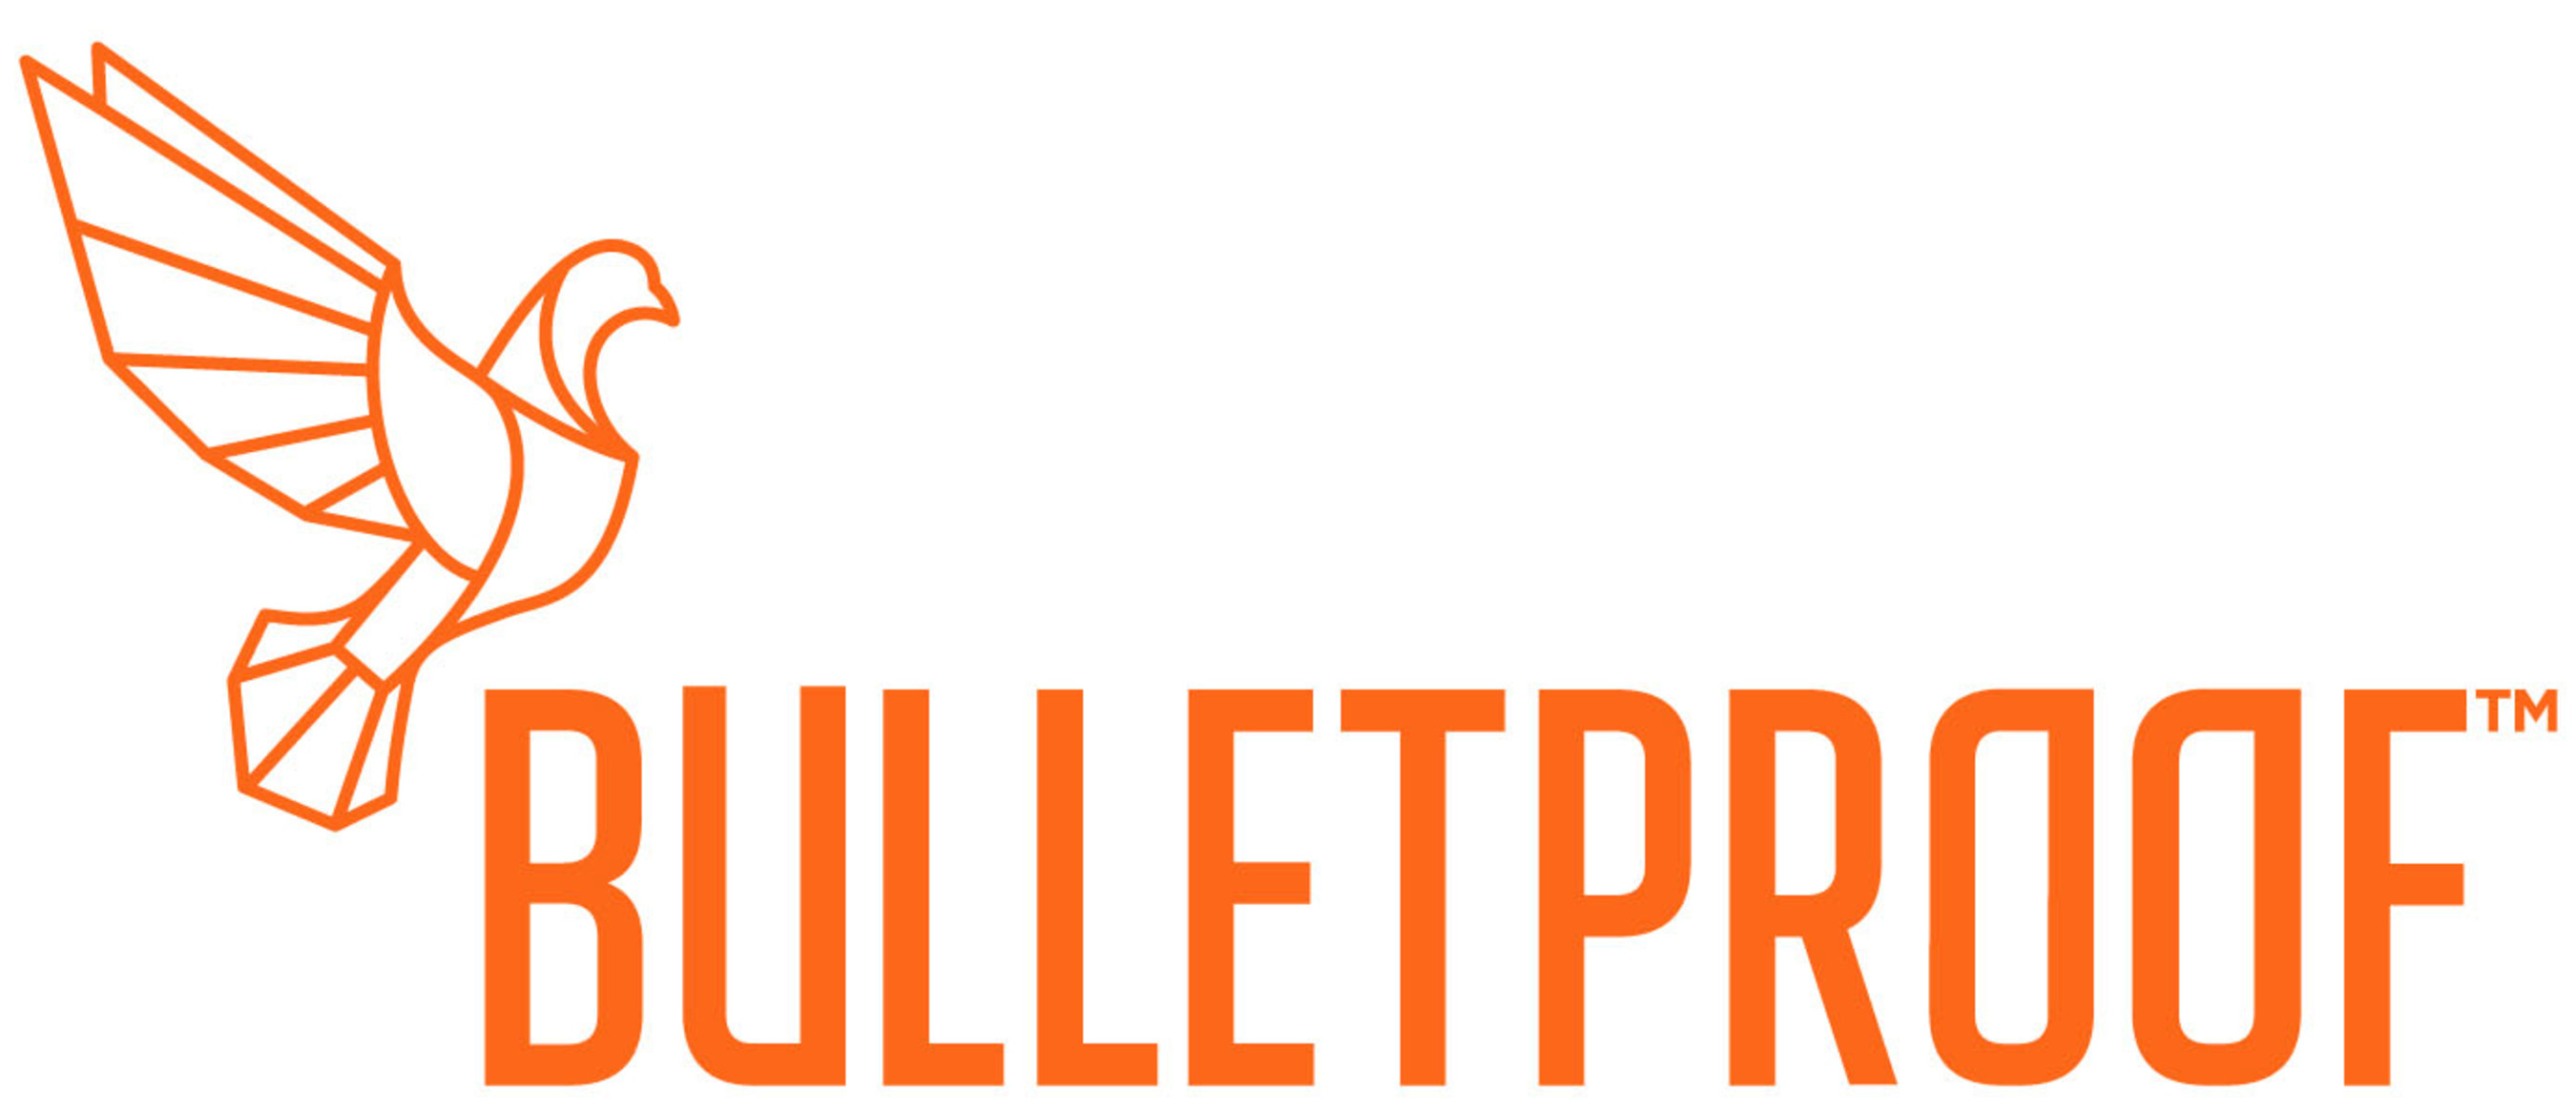 Blender-Free Bulletproof: Bulletproof® Announces Instamix